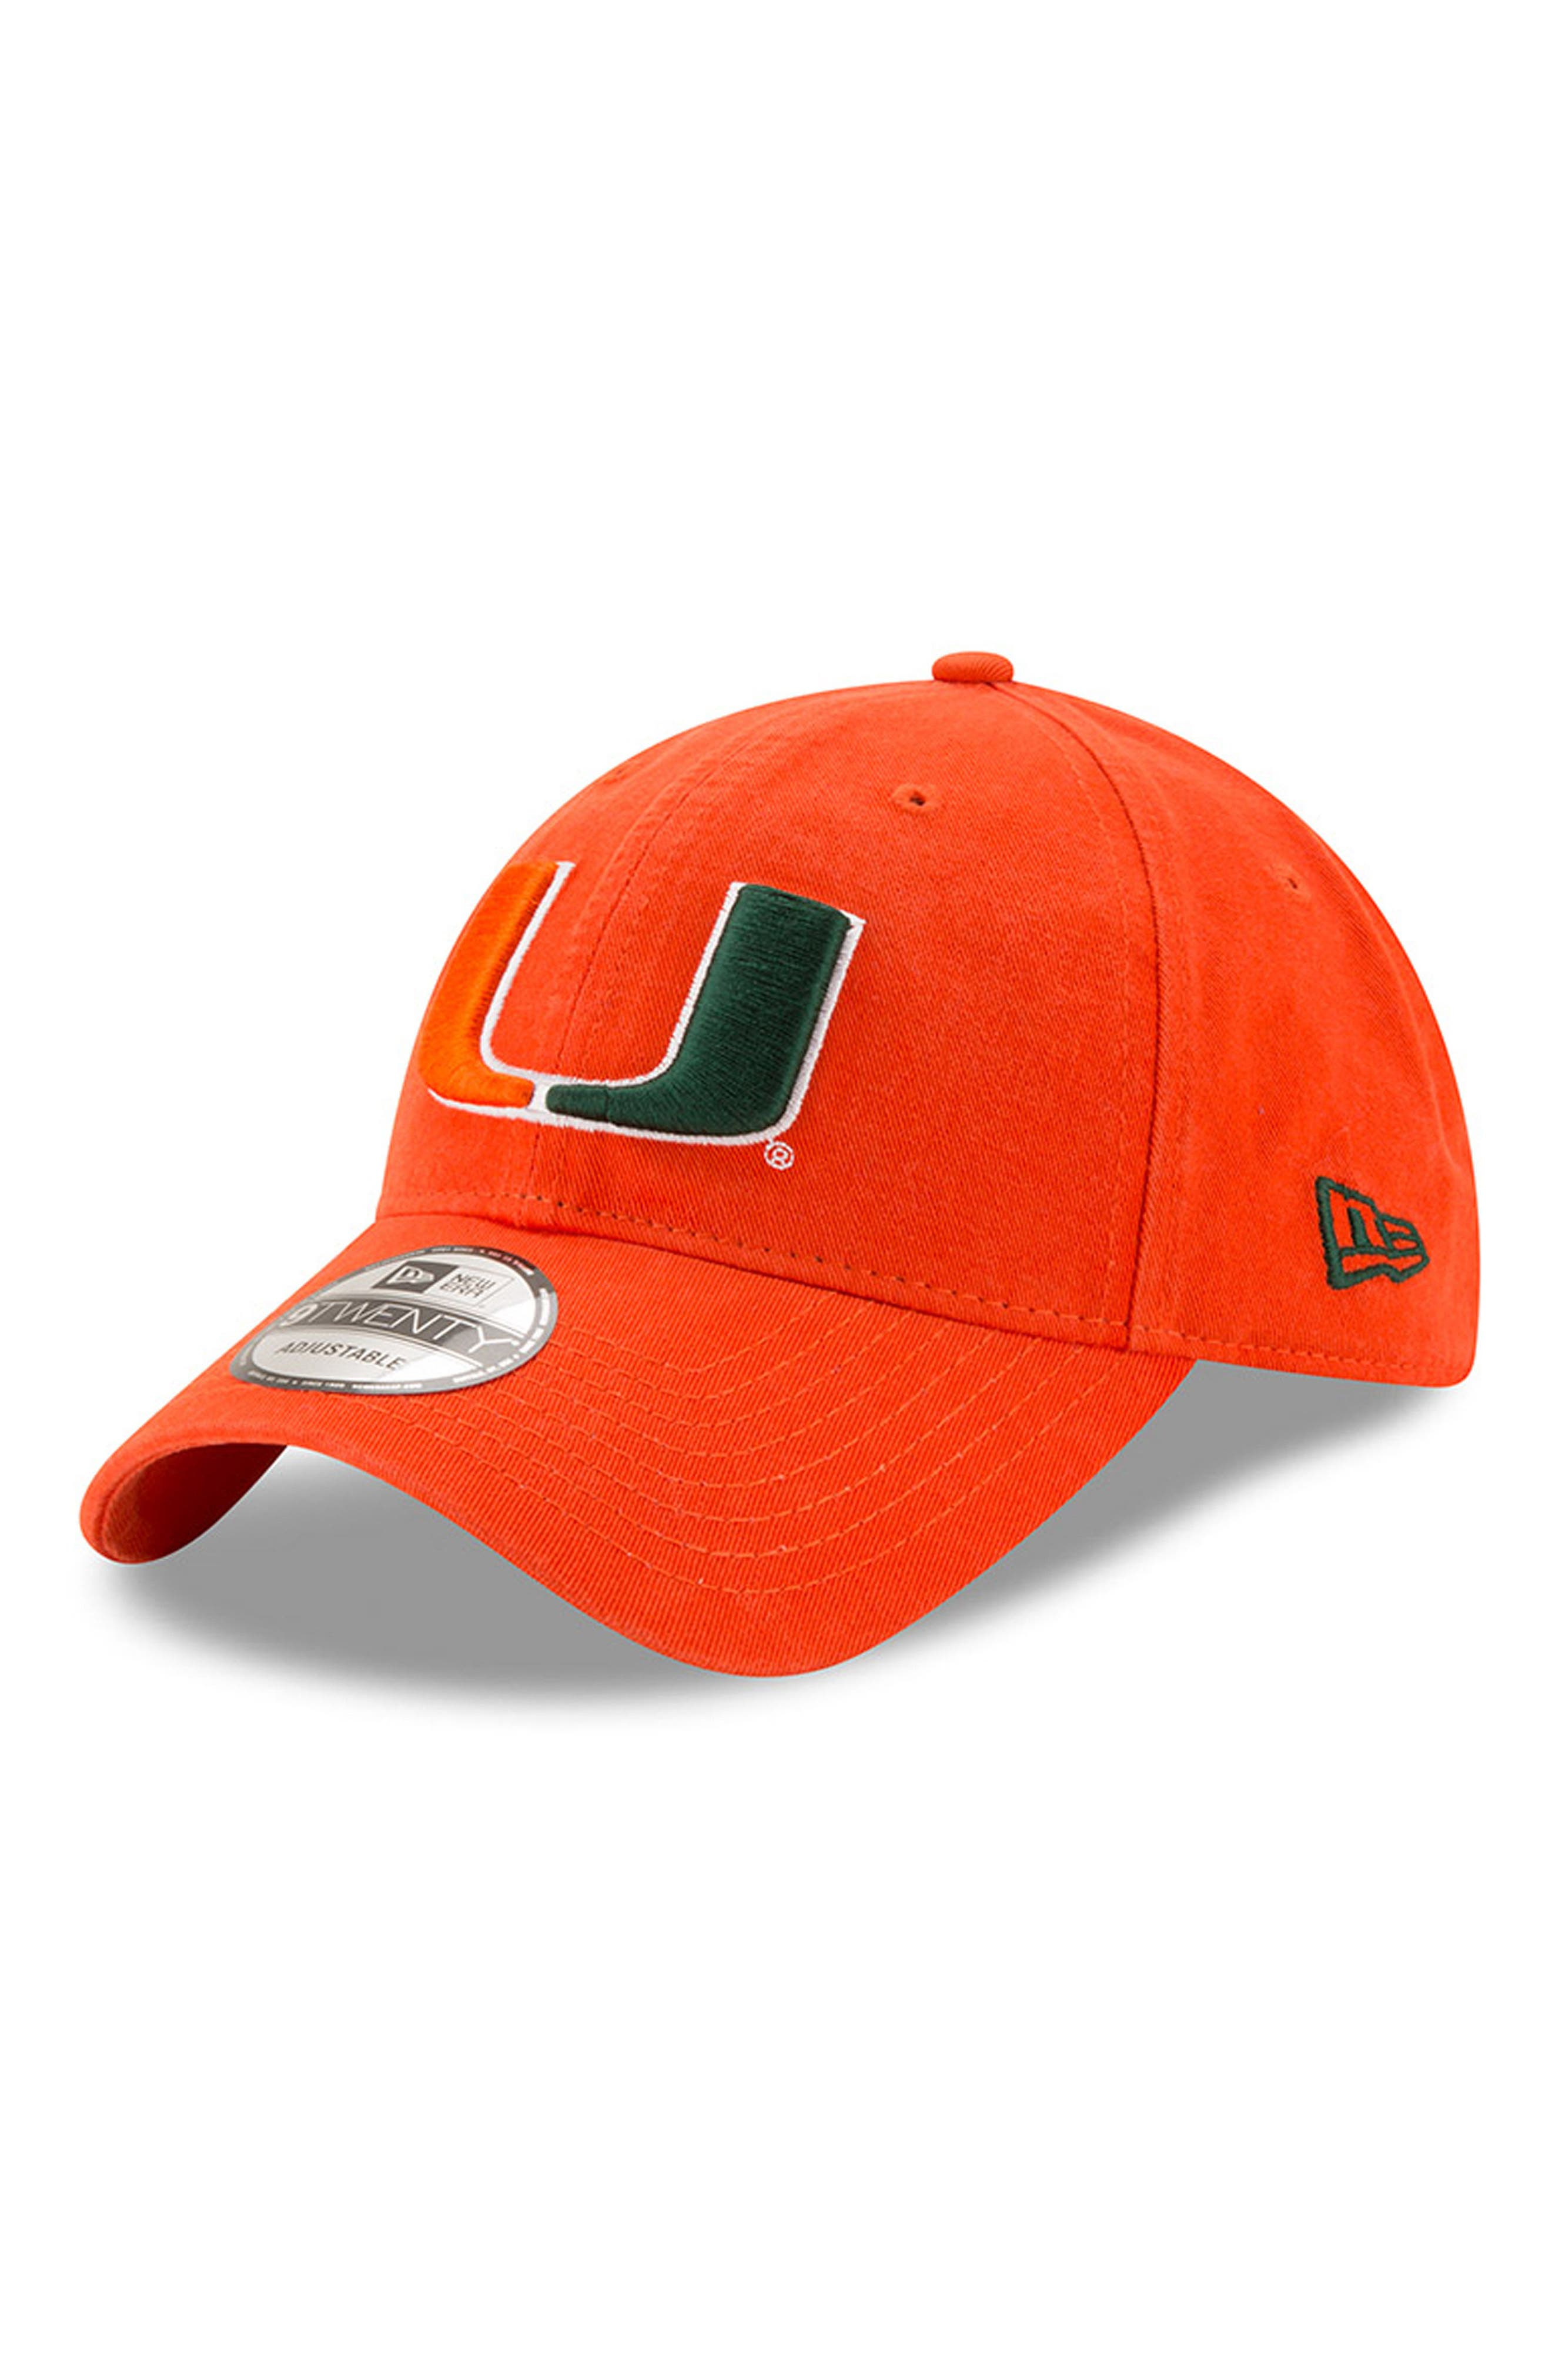 Main Image - New Era Collegiate Core Classic - Miami Hurricanes Baseball Cap